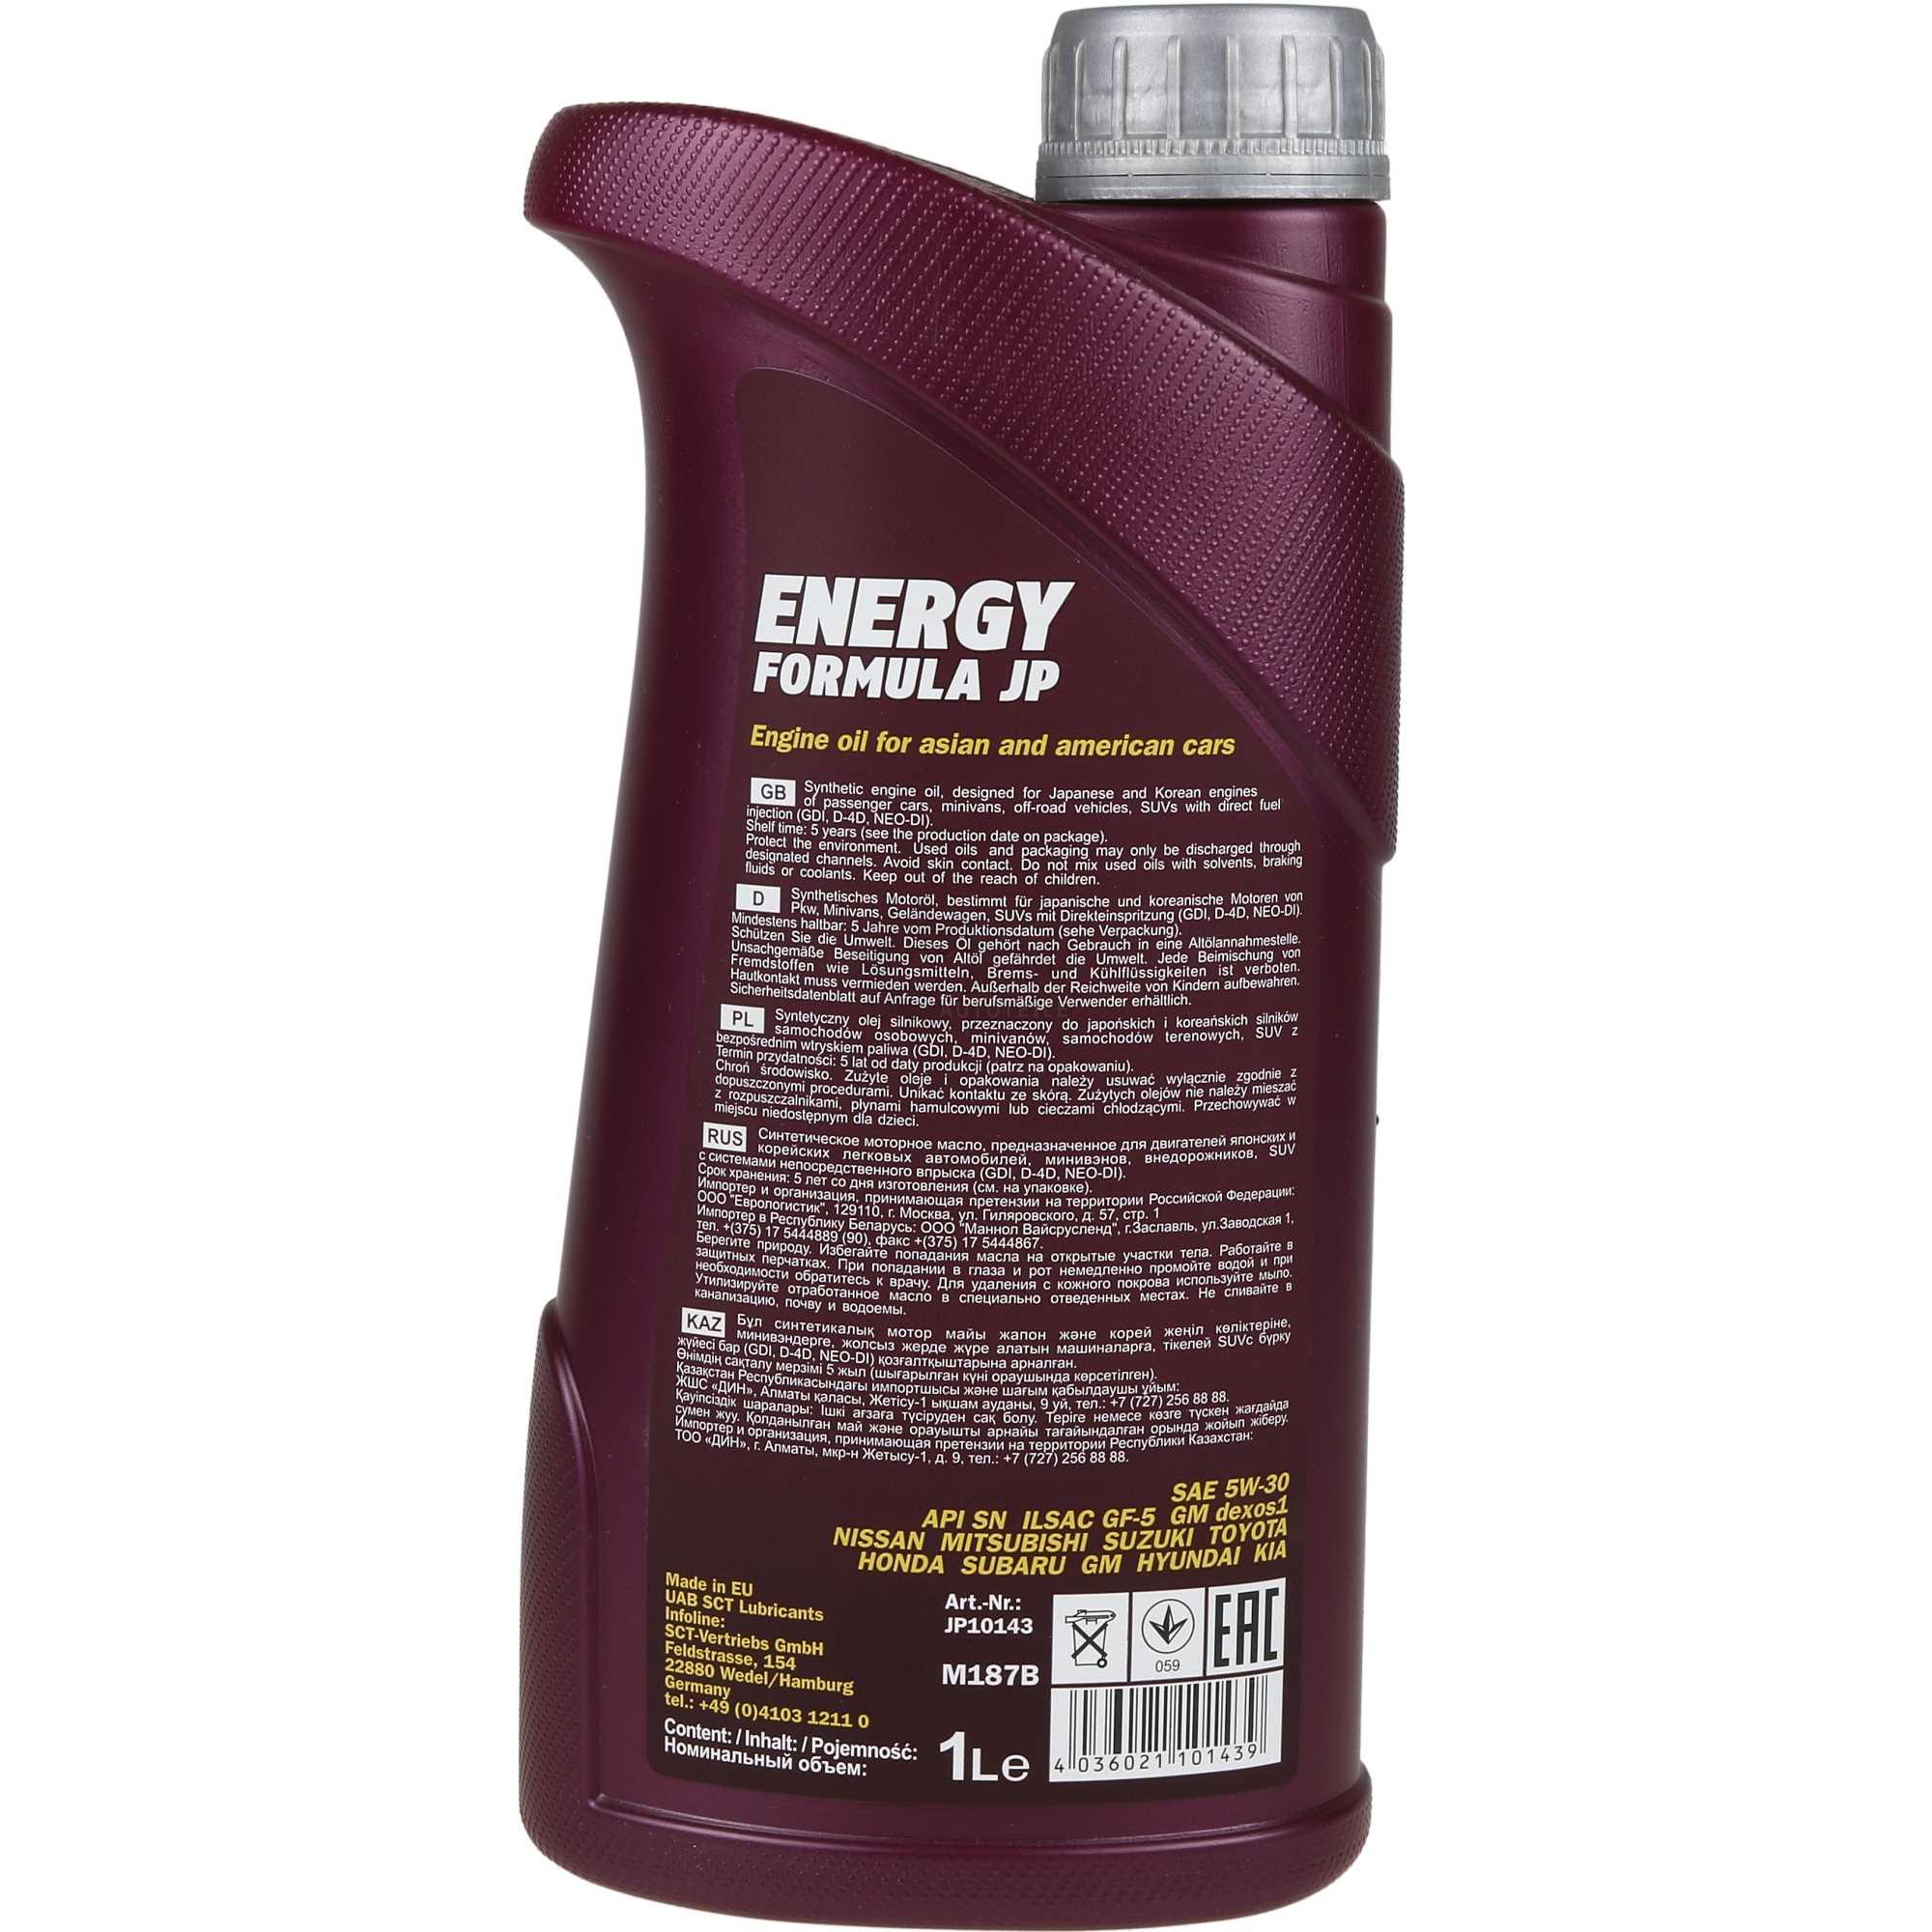 Aceite-del-motor-aceite-5w40-10w40-15w40-5w30-10w60-1l-4l-5l-7l-10l-20l miniatura 43